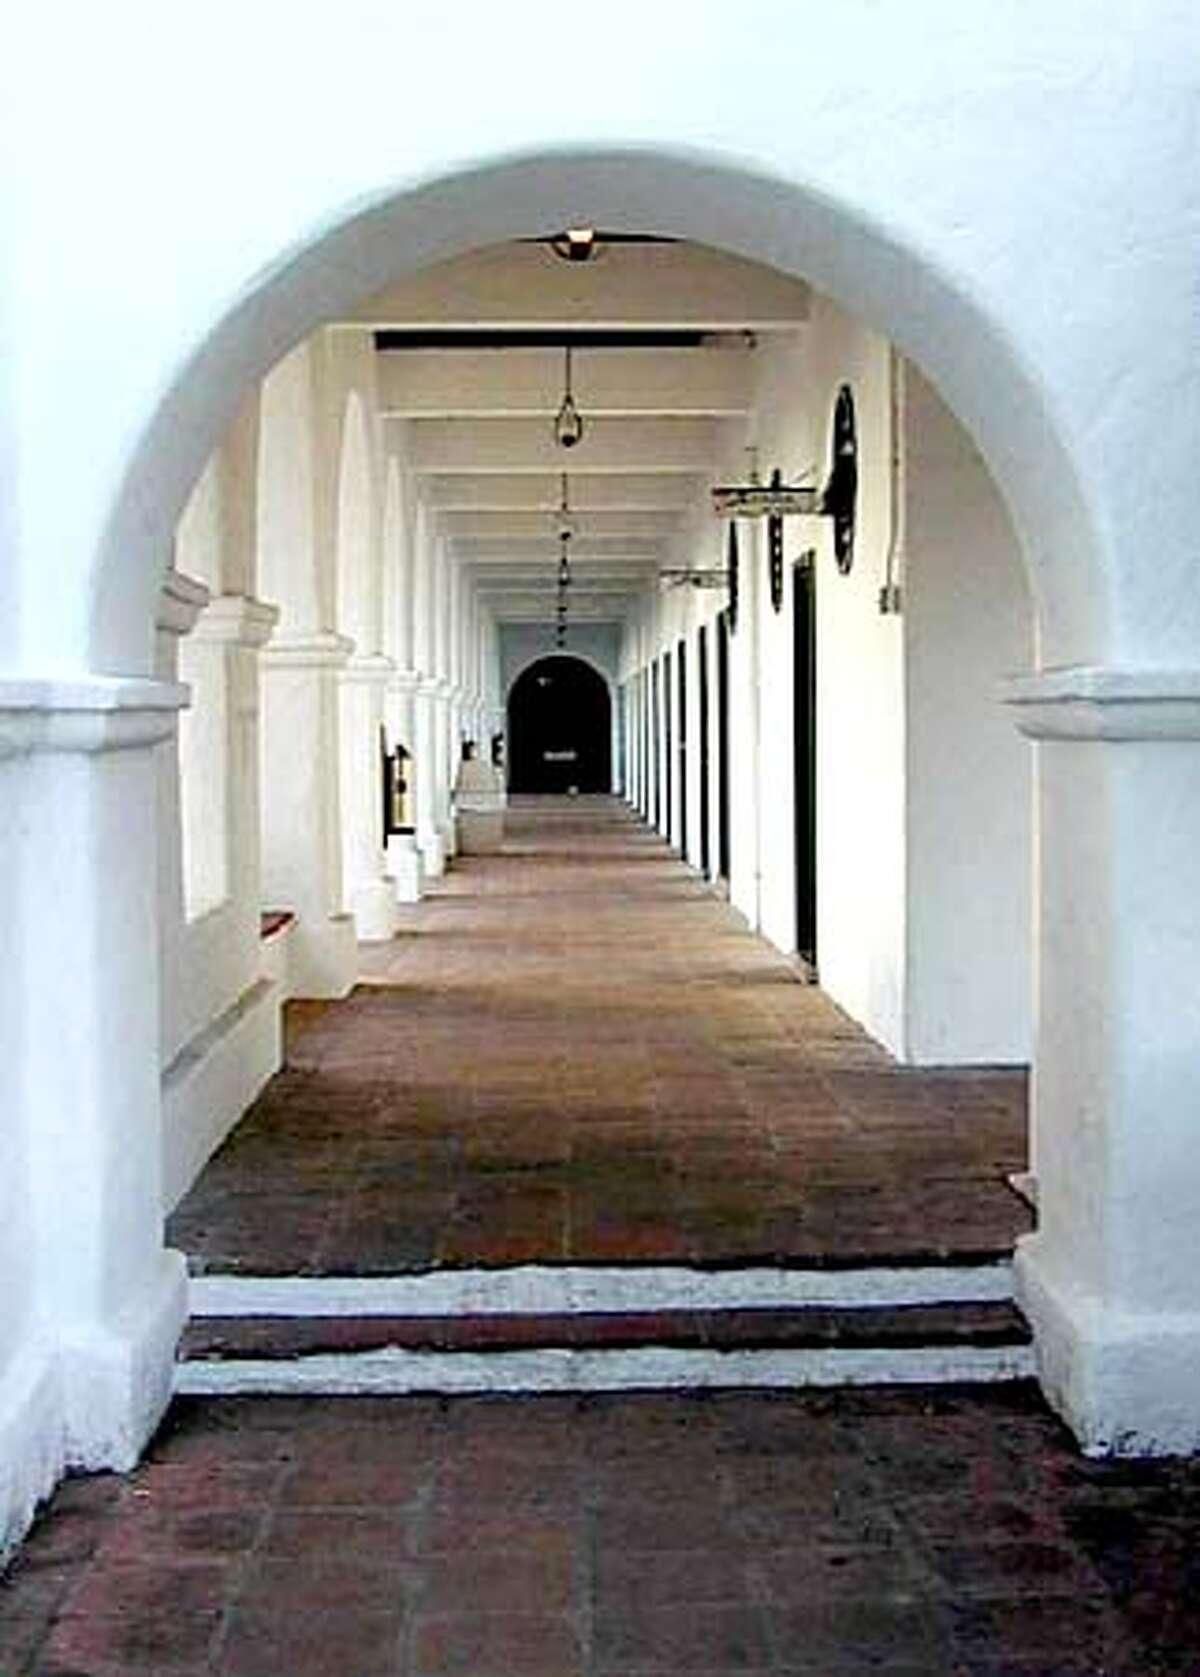 Walkway to guest rooms at The hacienda David Laws